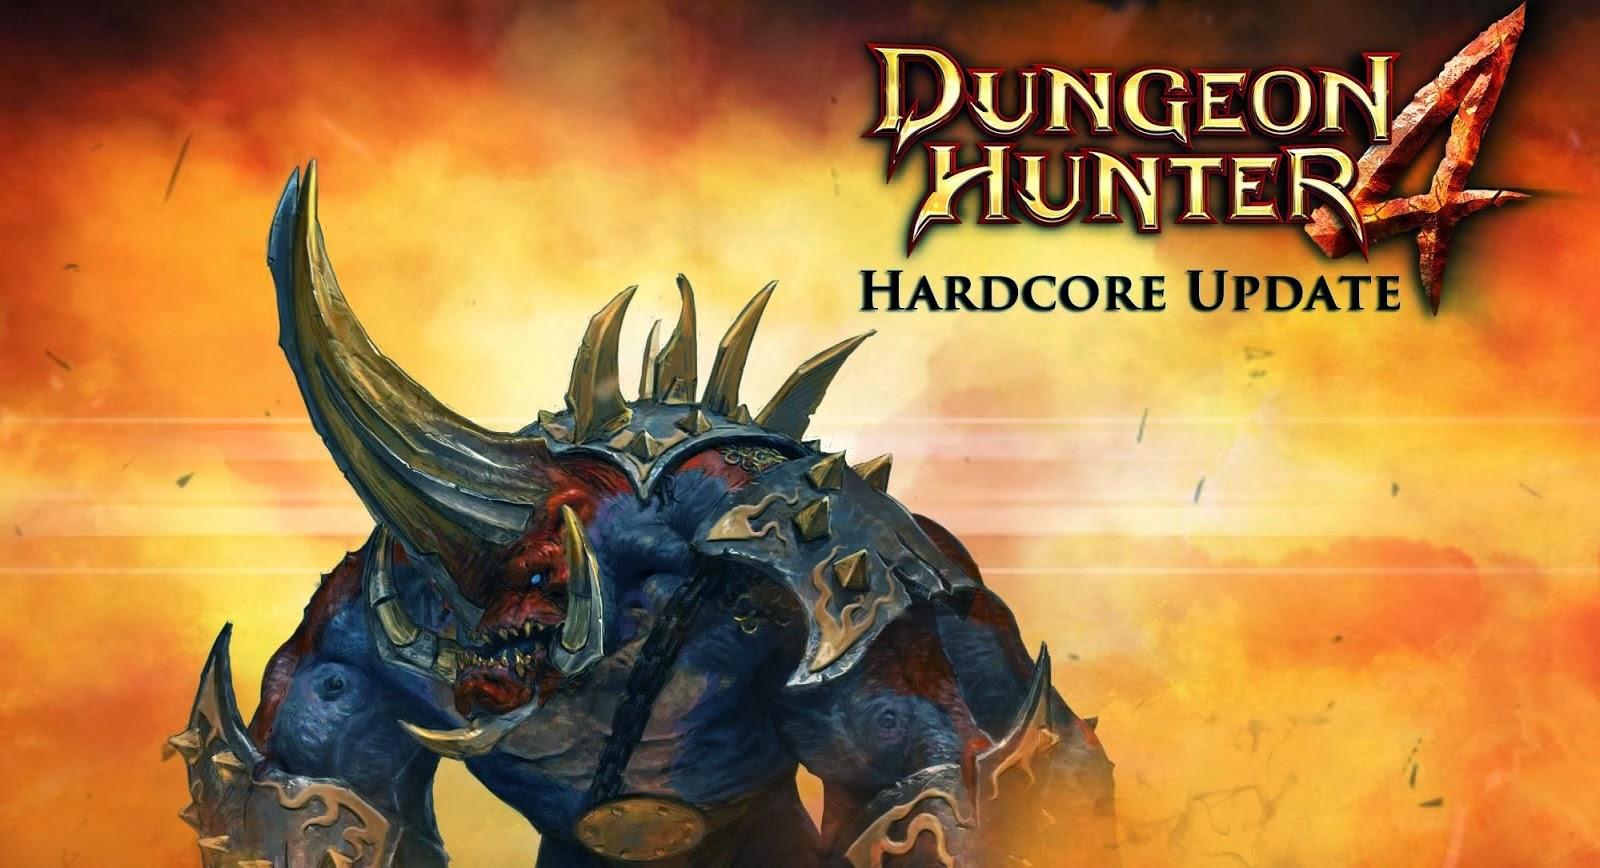 ... dungeon hunter 1 2 3 hom nay gameloft tiếp tục ra mắt dungeon